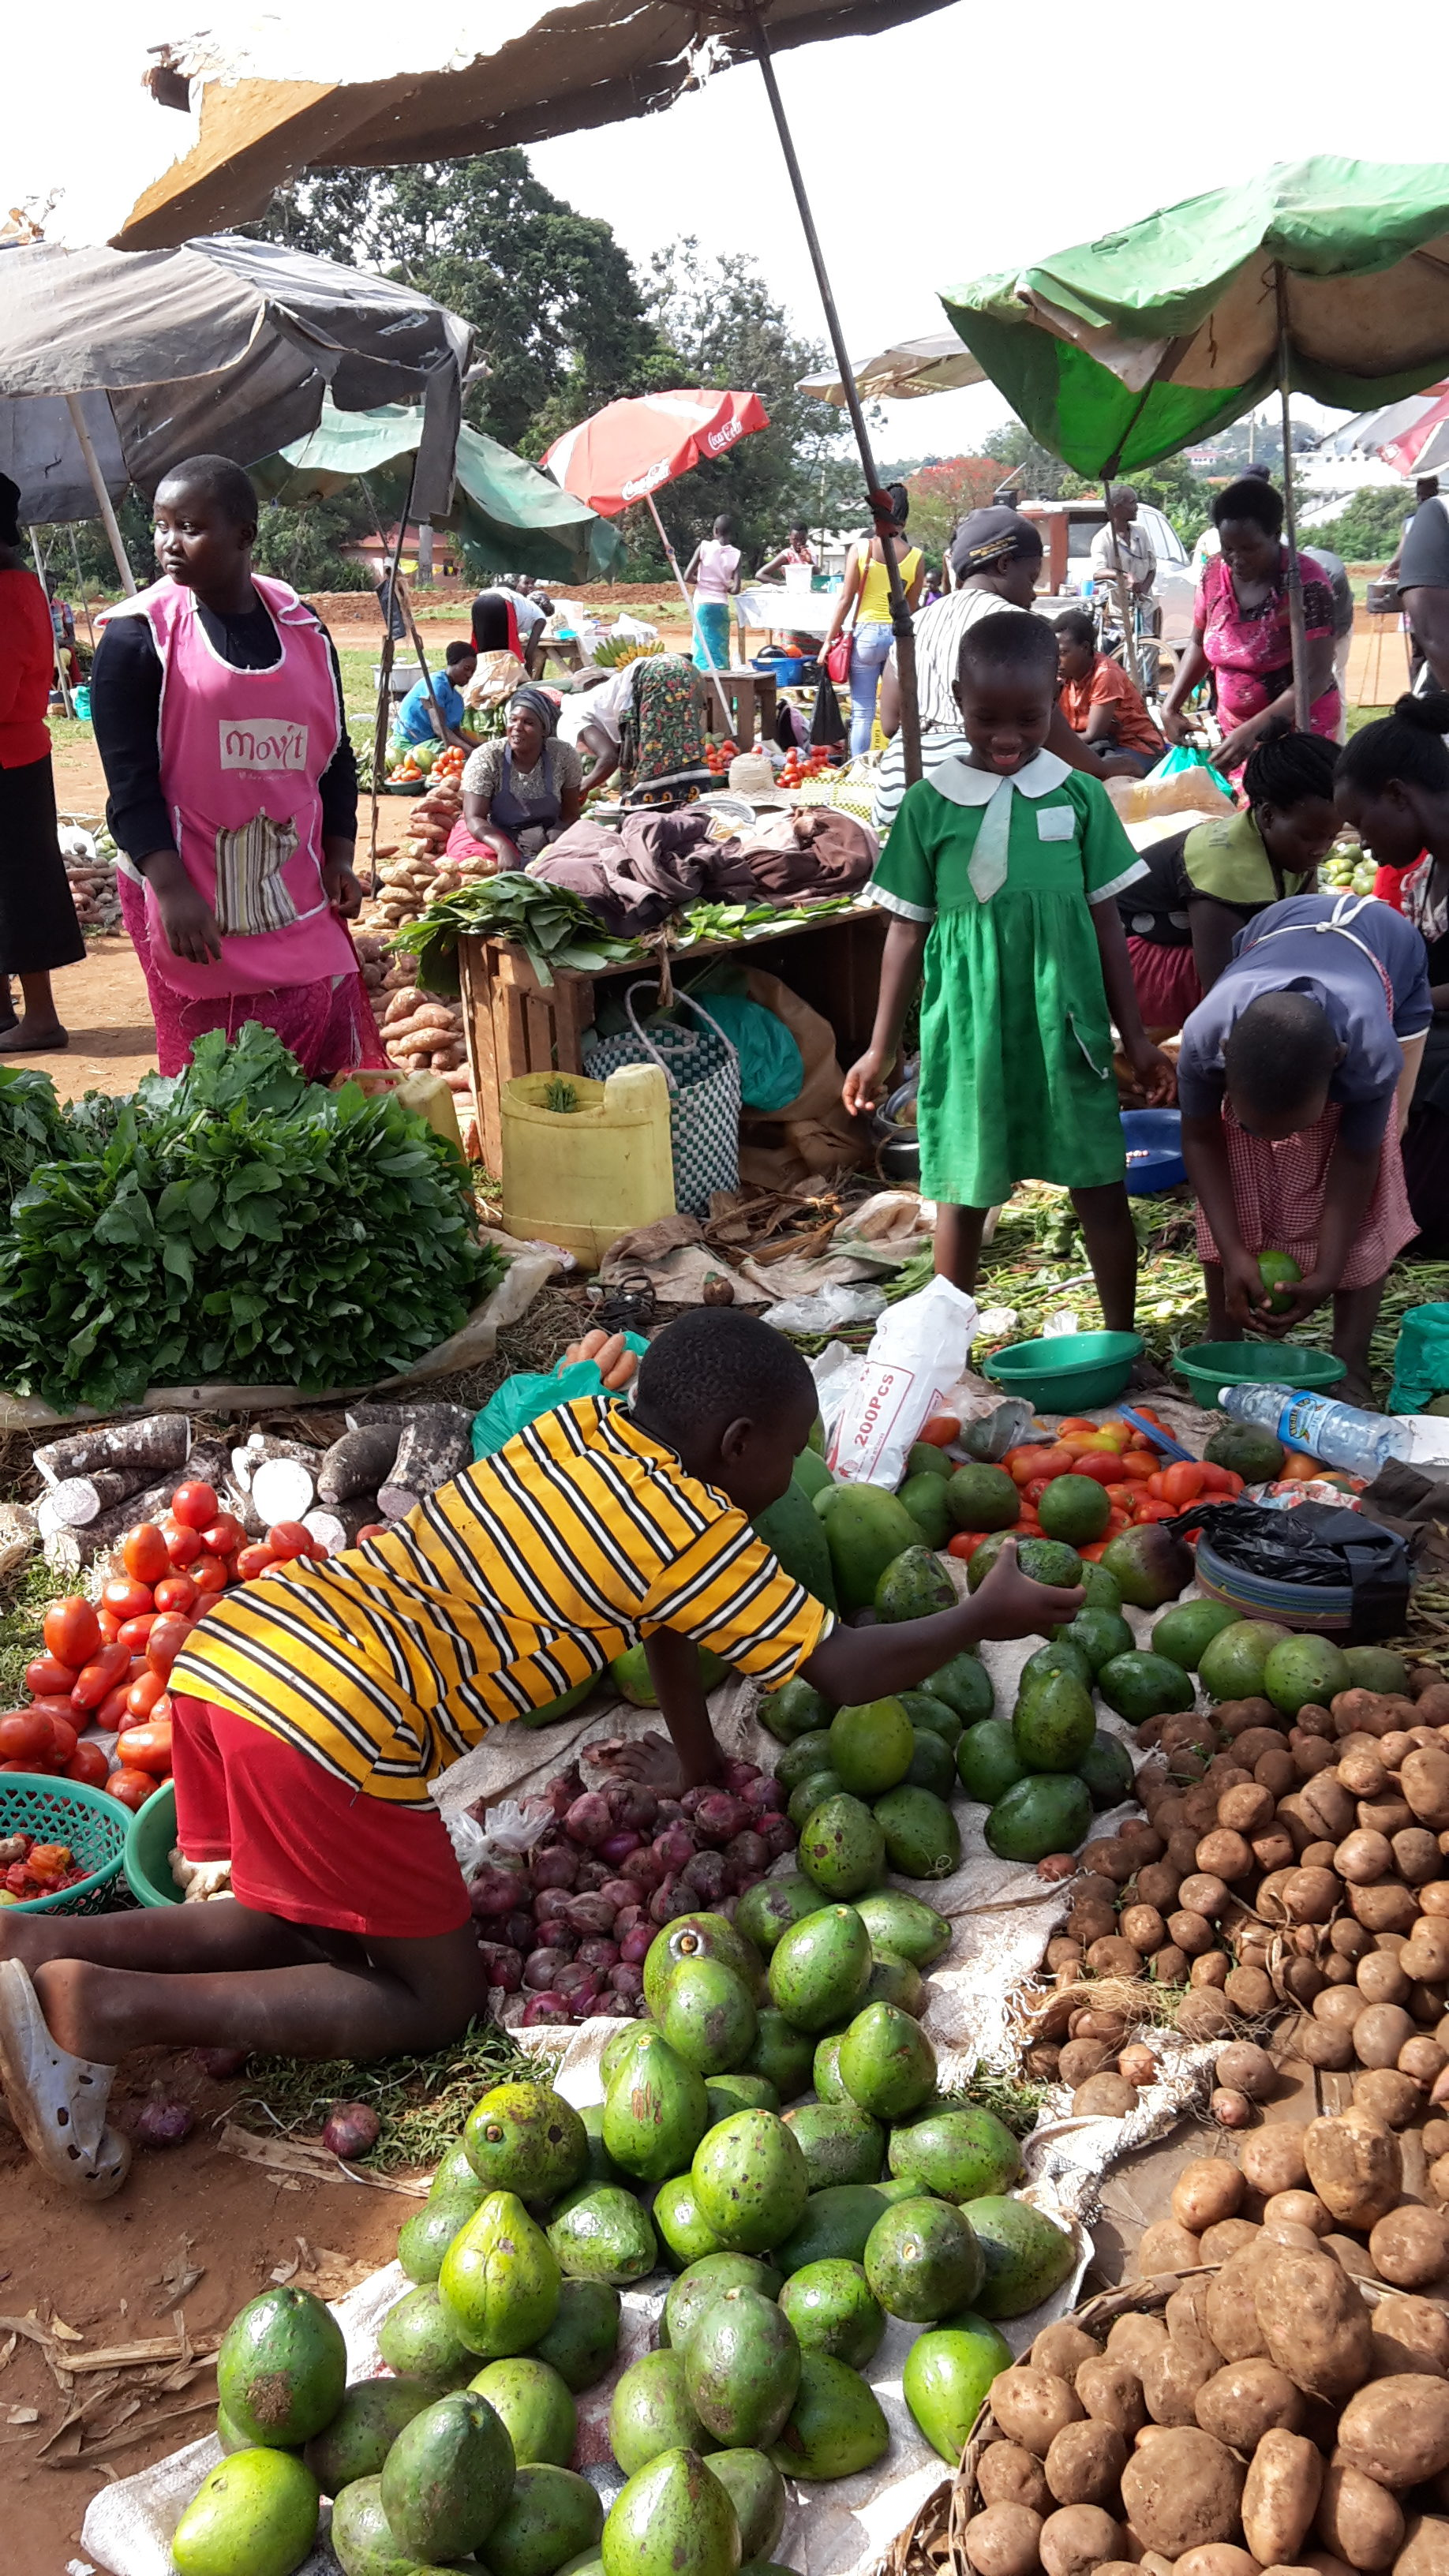 Markt in Entebbe